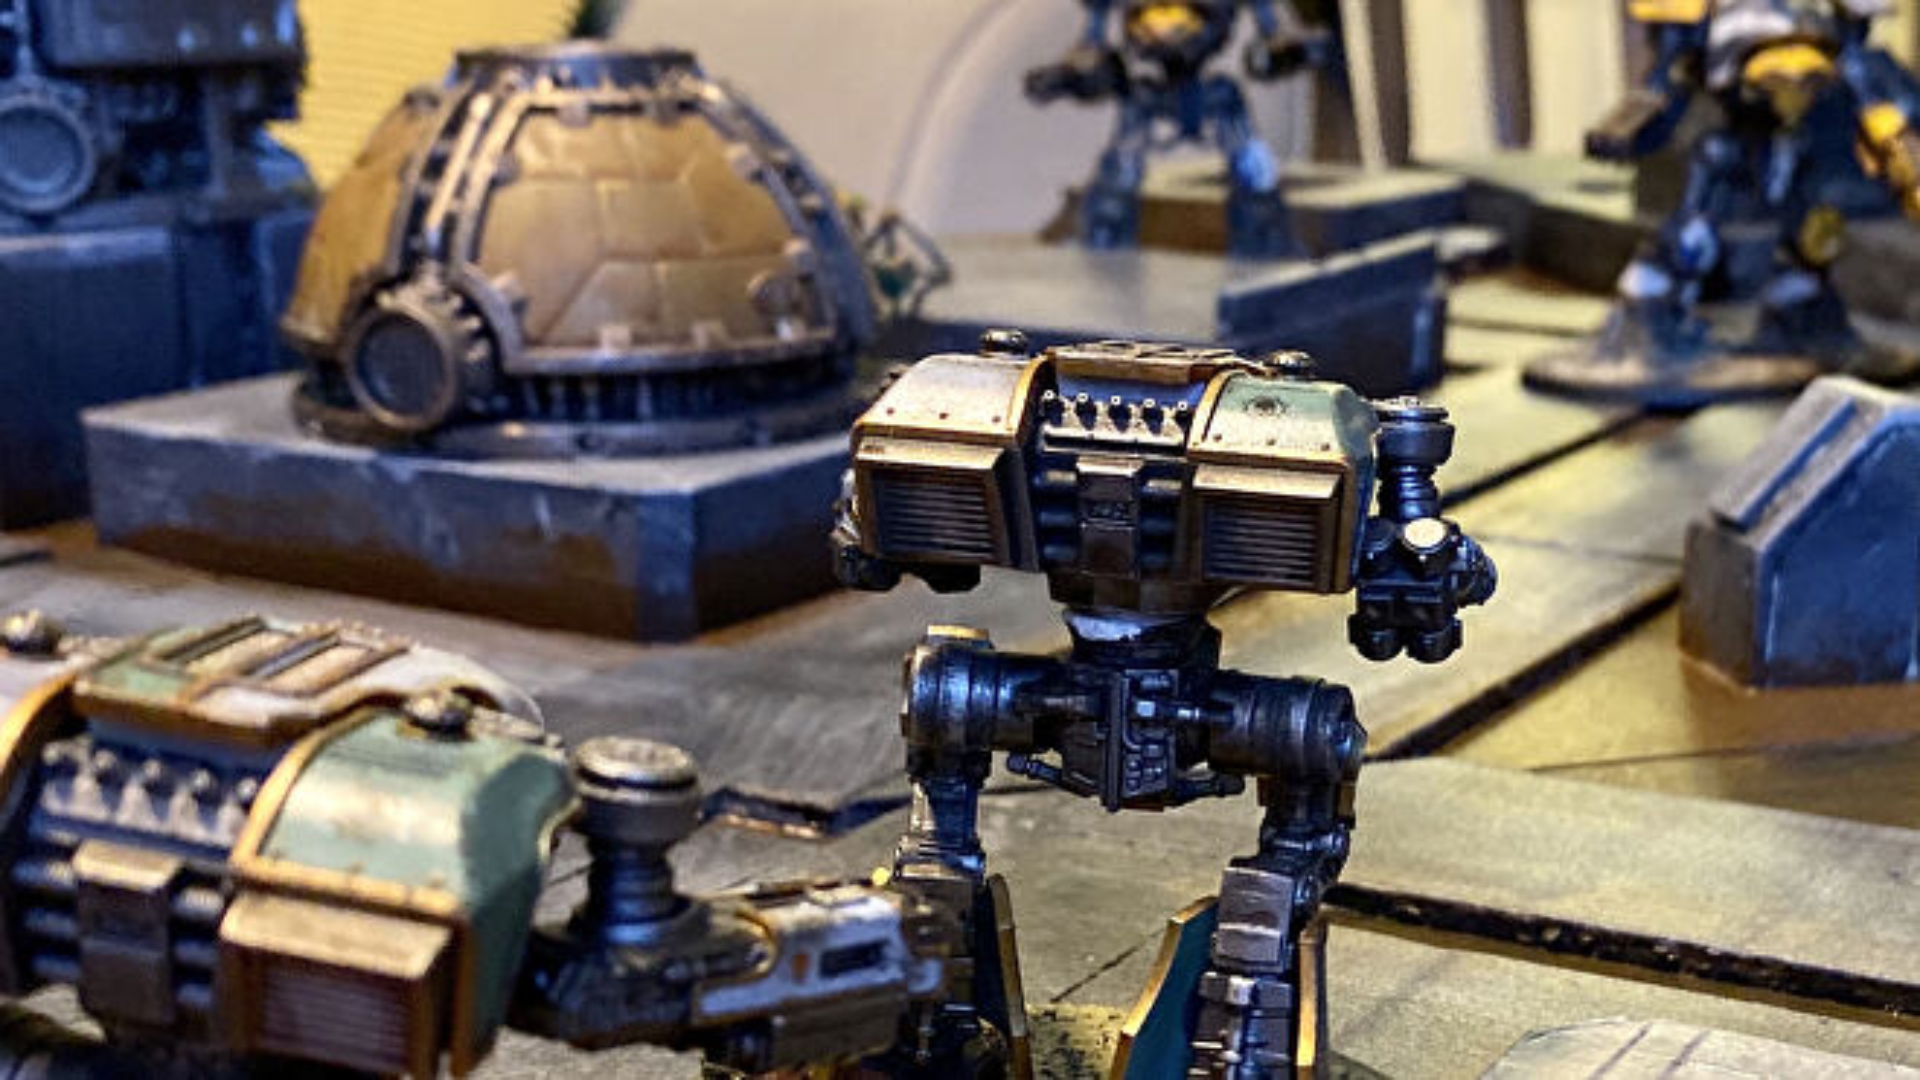 warhammer-40k-adeptus-titanicus-4.jpg